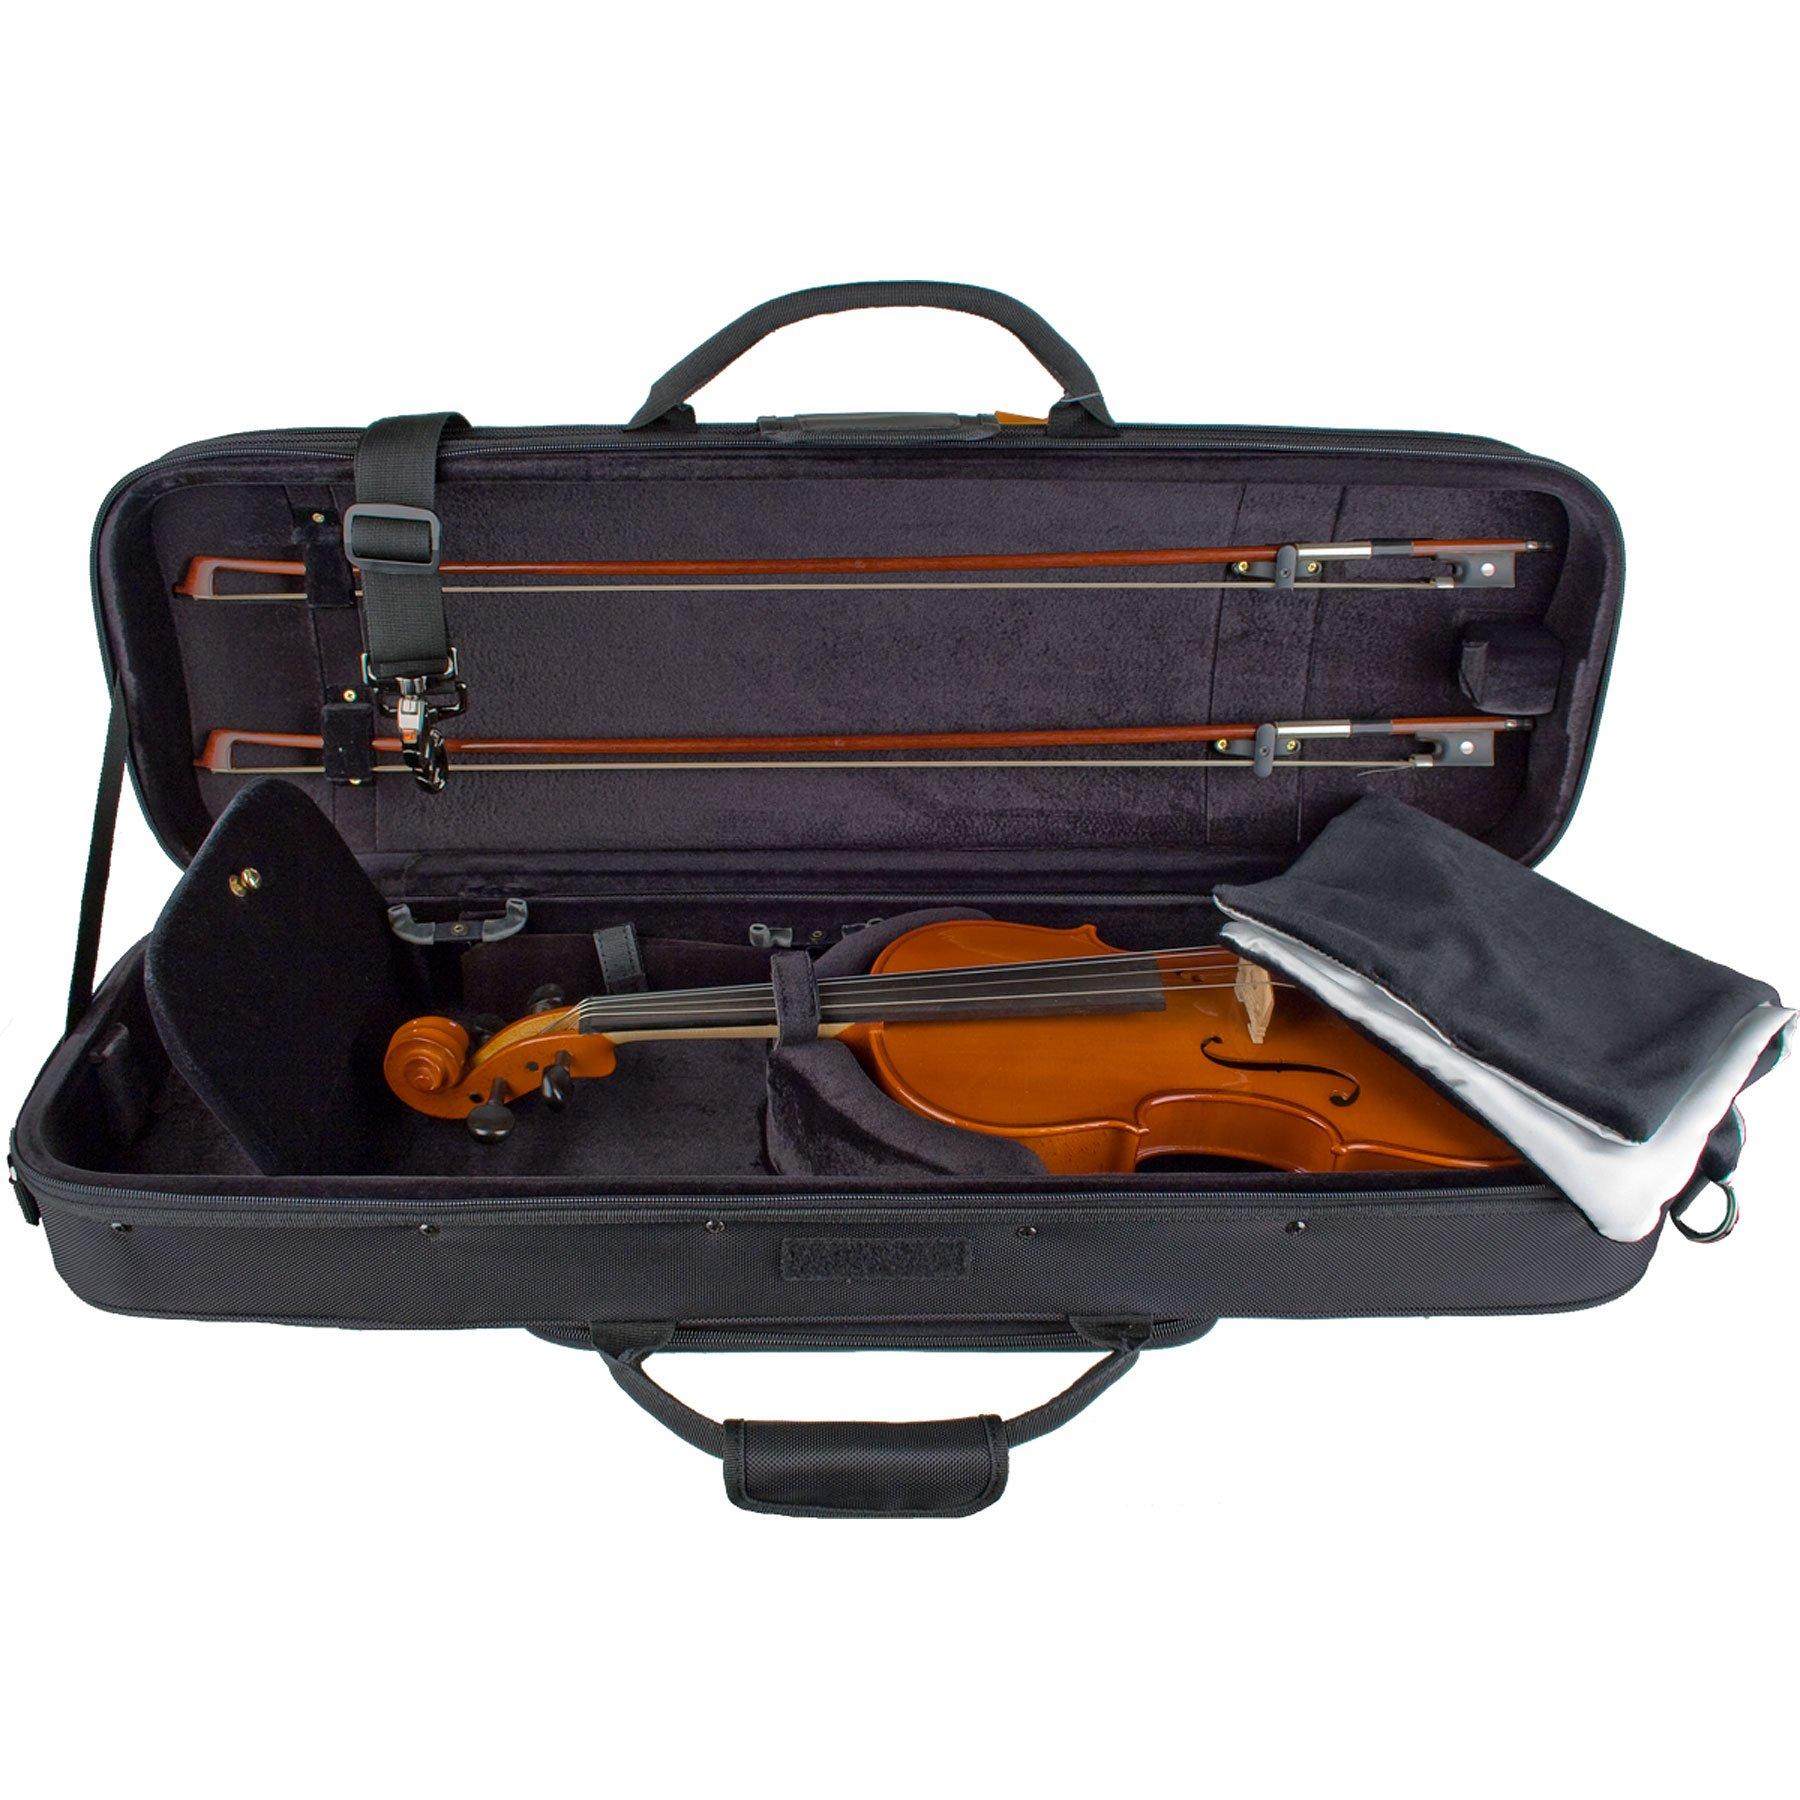 Protec Deluxe 4/4 Violin PRO PAC Case - Black Interior by ProTec (Image #3)